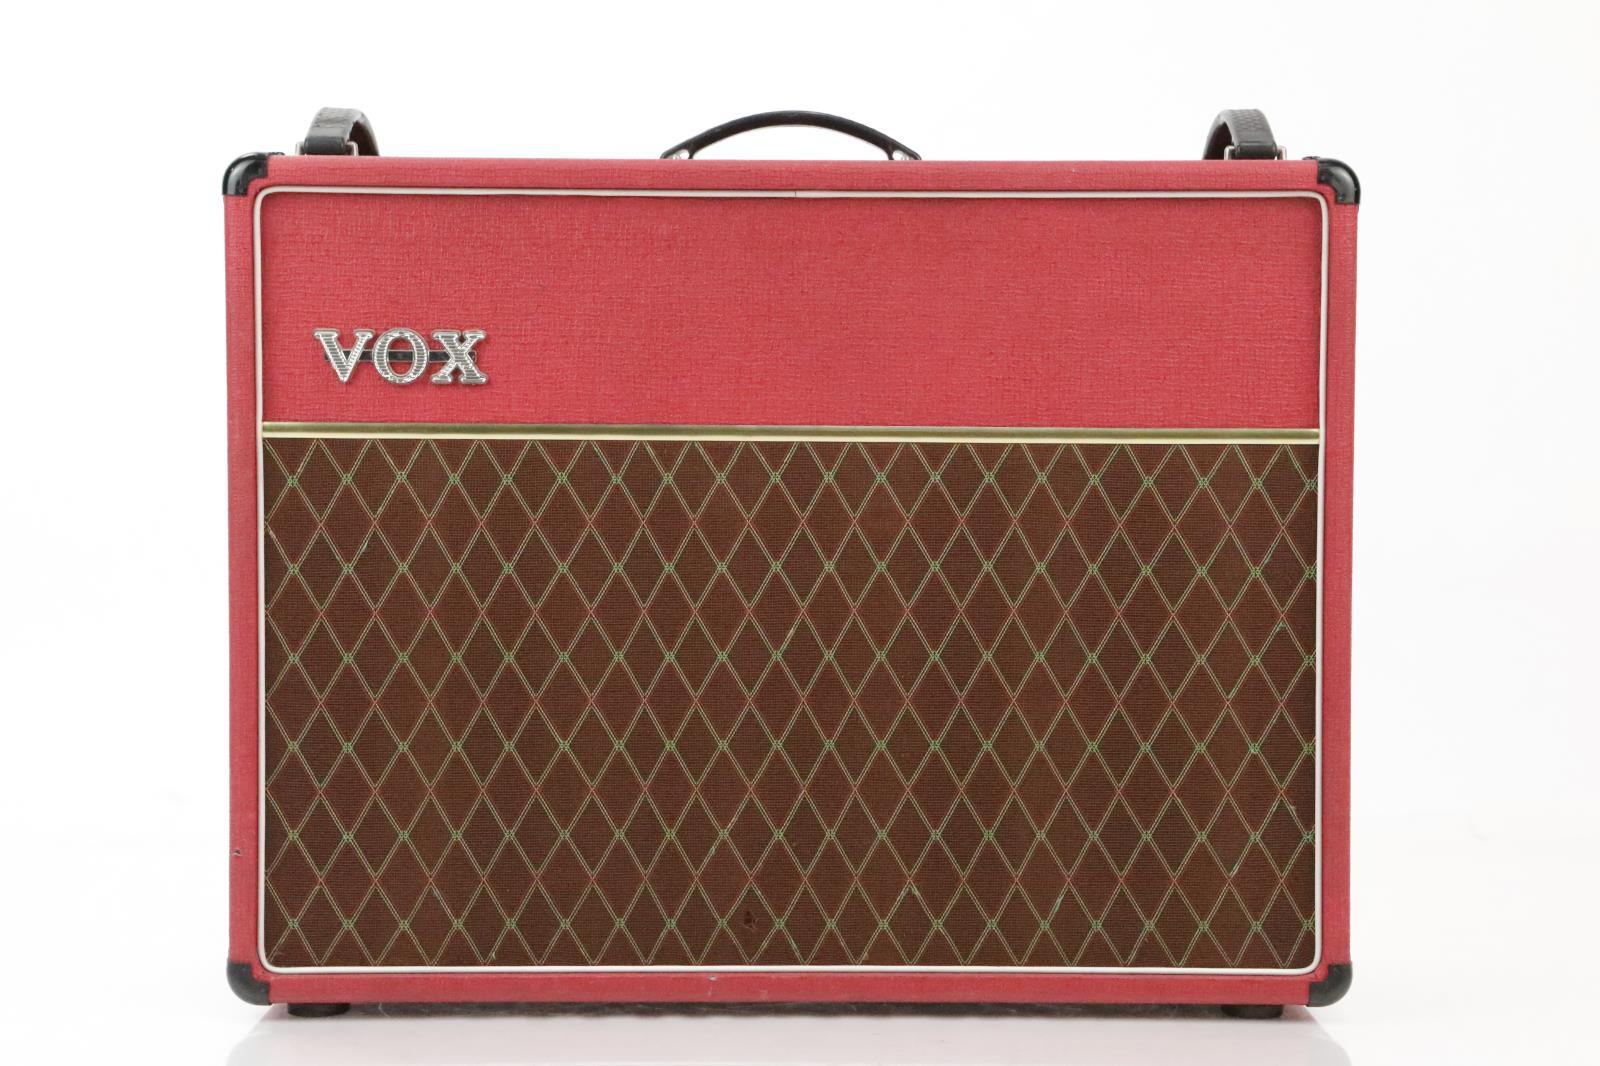 Vox AC30/6 TB Rare Red 2x12 Combo Guitar Tube Amp Bruce Kulick Kiss #34418